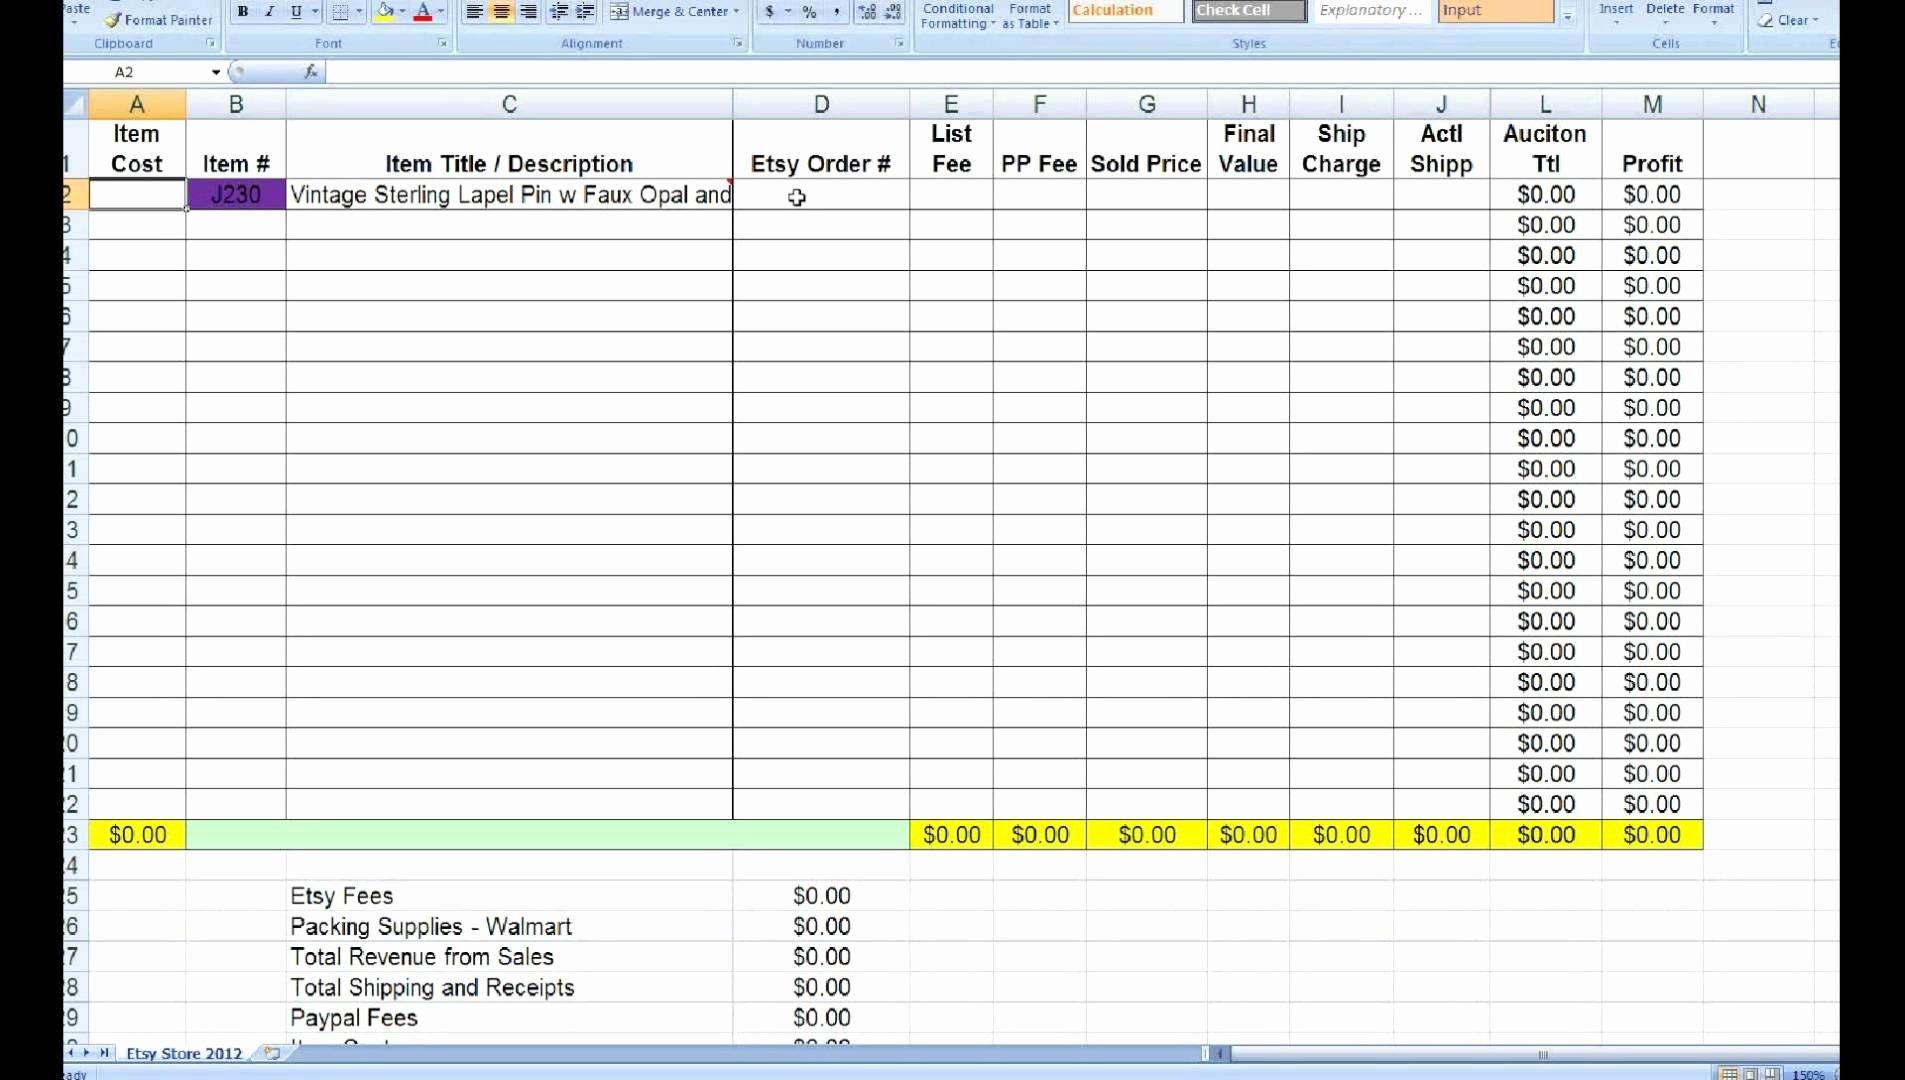 Schedule C Excel Template Best Of Schedule C Expense Excel Template